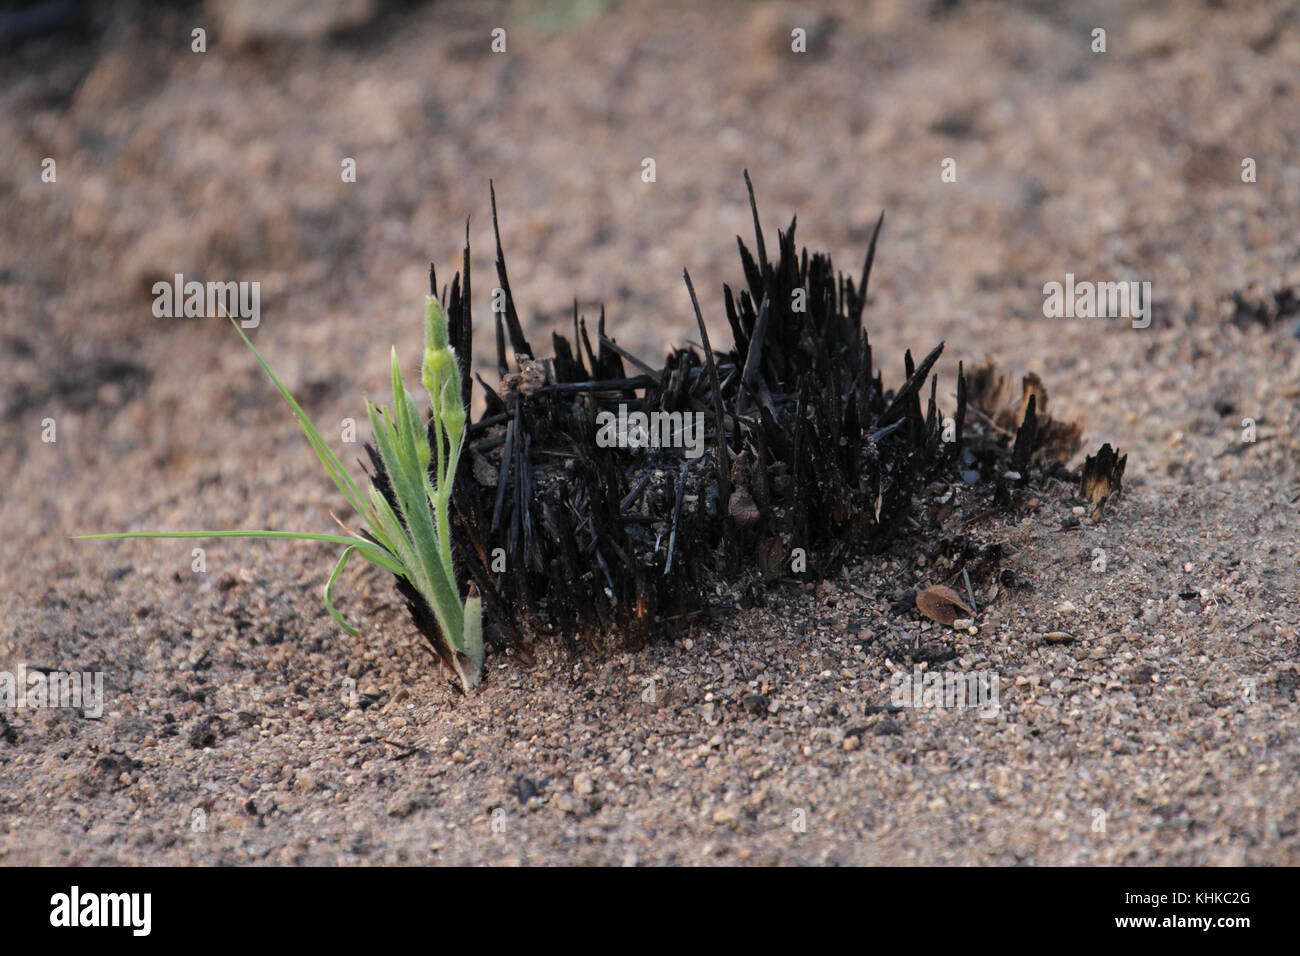 Matobo Park, Zimbabwe - 17 October 2011: Fresh growth of grass on the plains of Matobo National Park. Credit: David - Stock Image